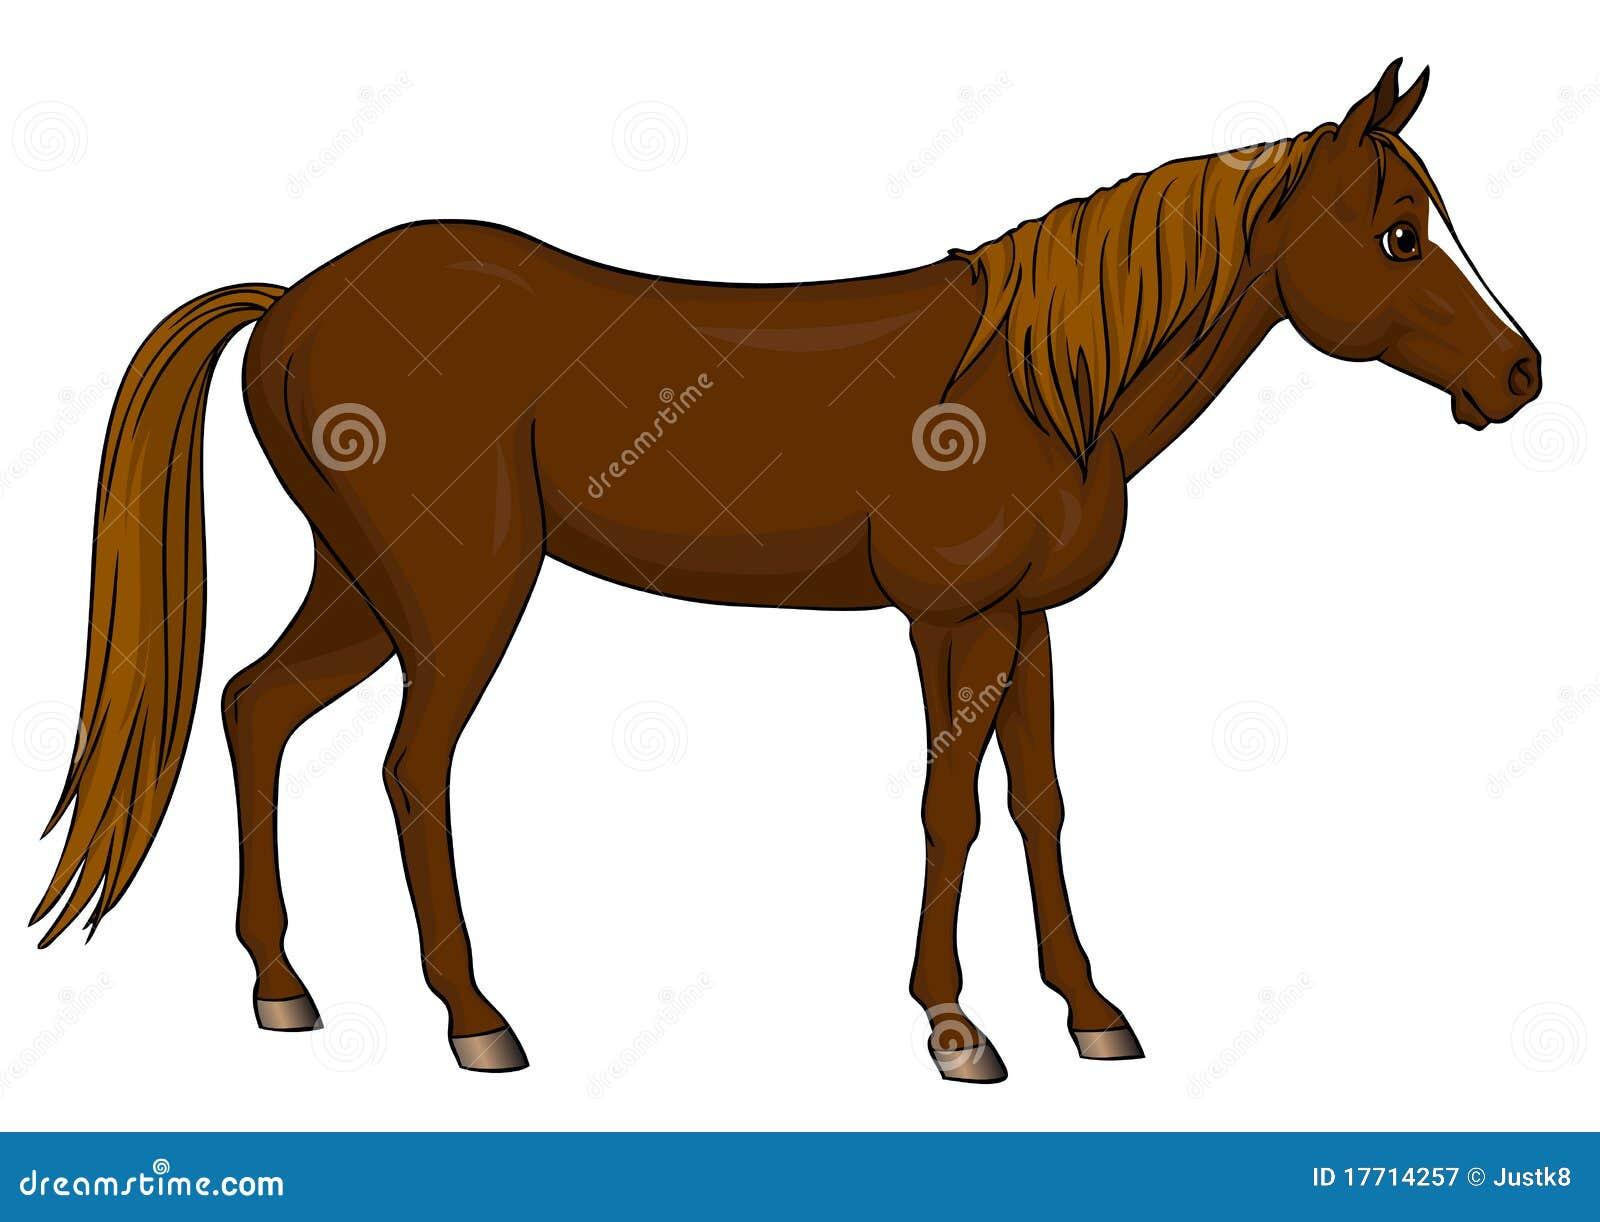 Position de cheval de dessin anim illustration de vecteur illustration du lumi re arri re - Dessin un cheval ...